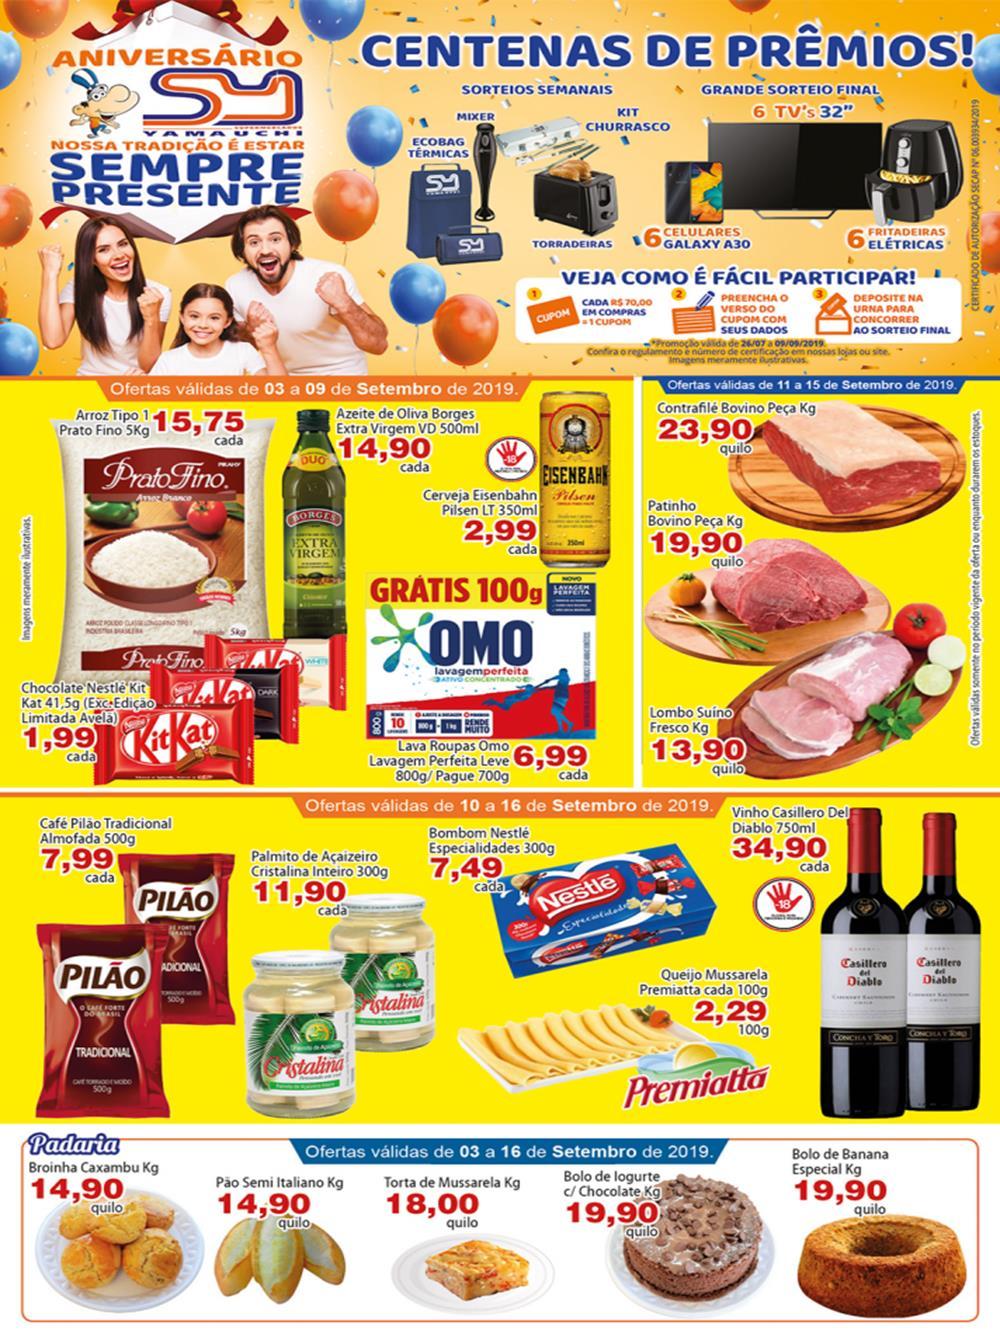 Ofertas-yamauchi4 Supermercados